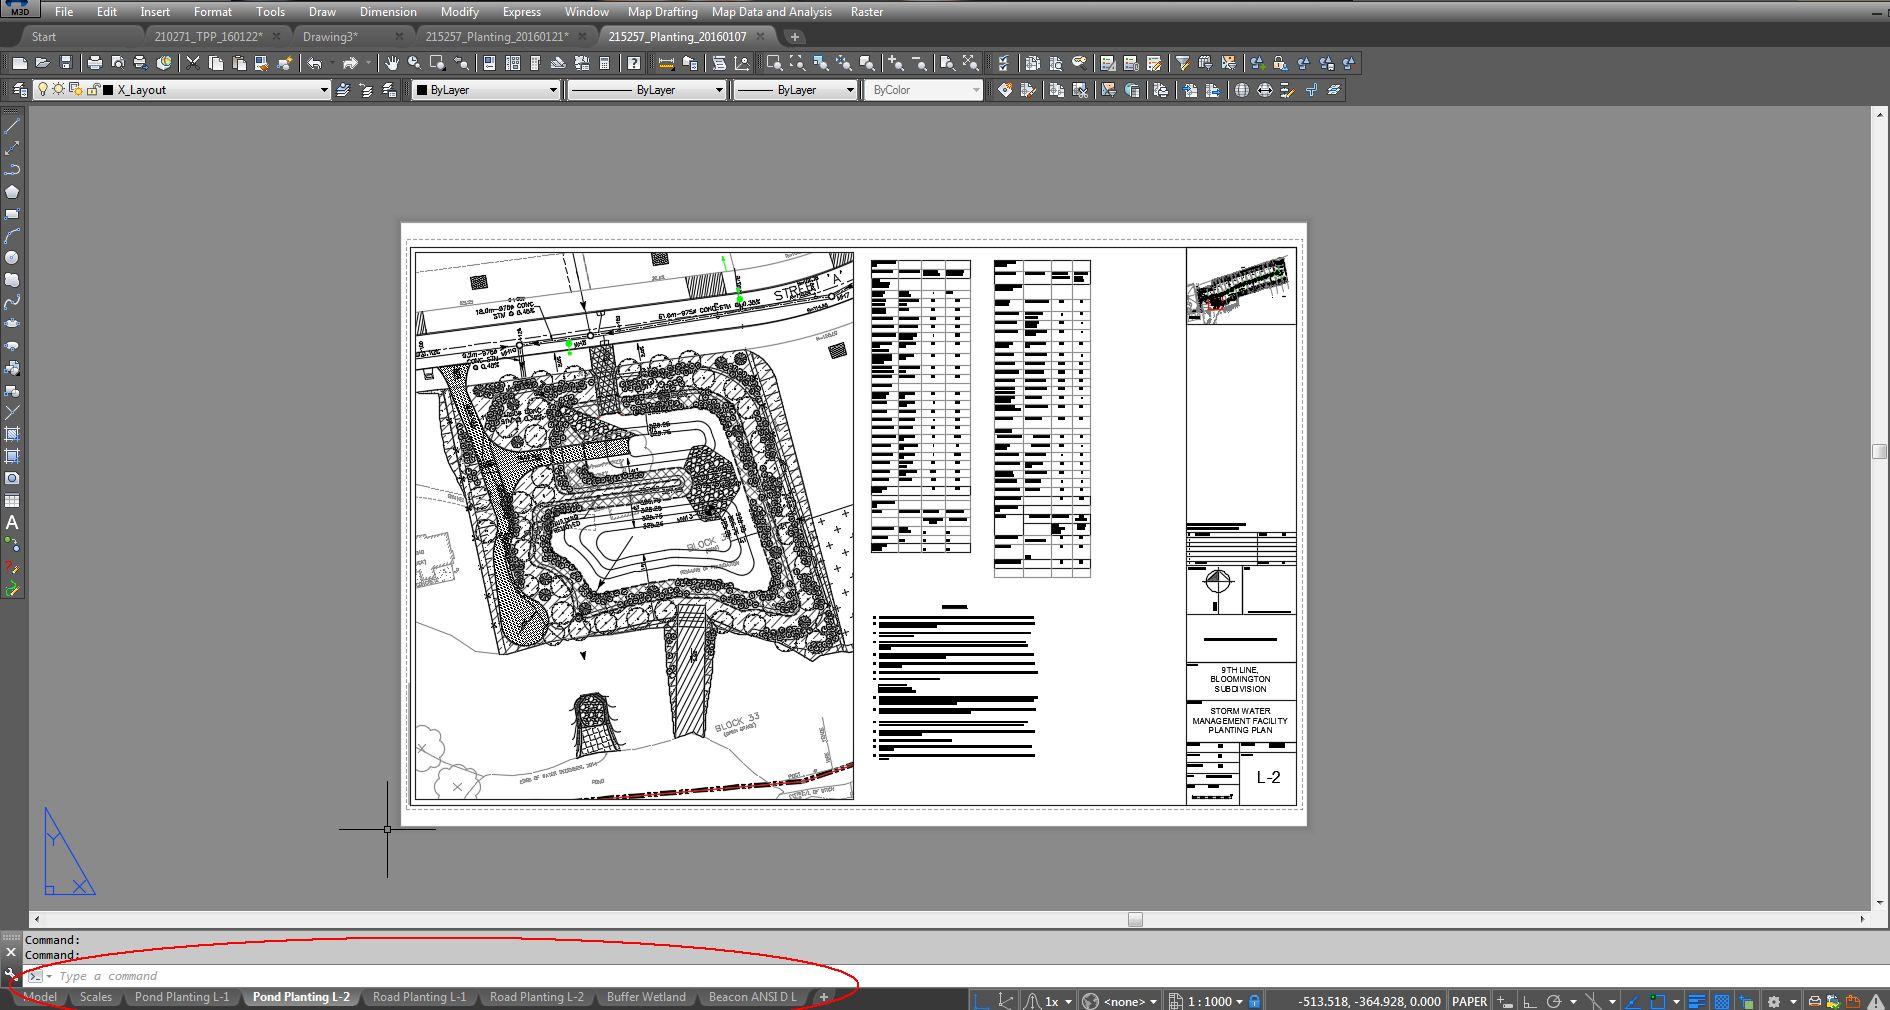 Tolle Verdrahtungsdesign Software Galerie - Verdrahtungsideen ...